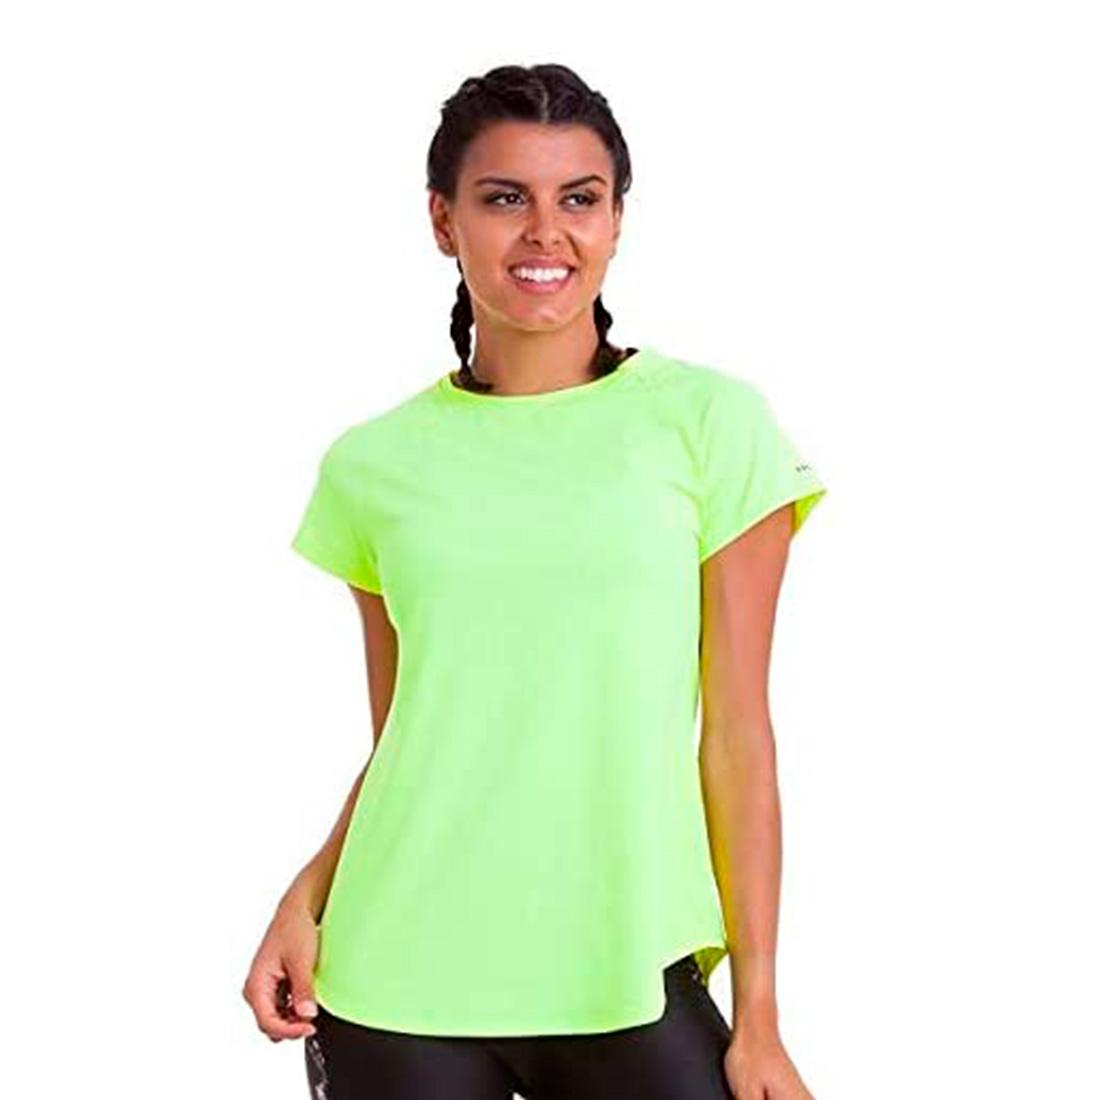 Camiseta Authen Chief - Amarelo Baliza